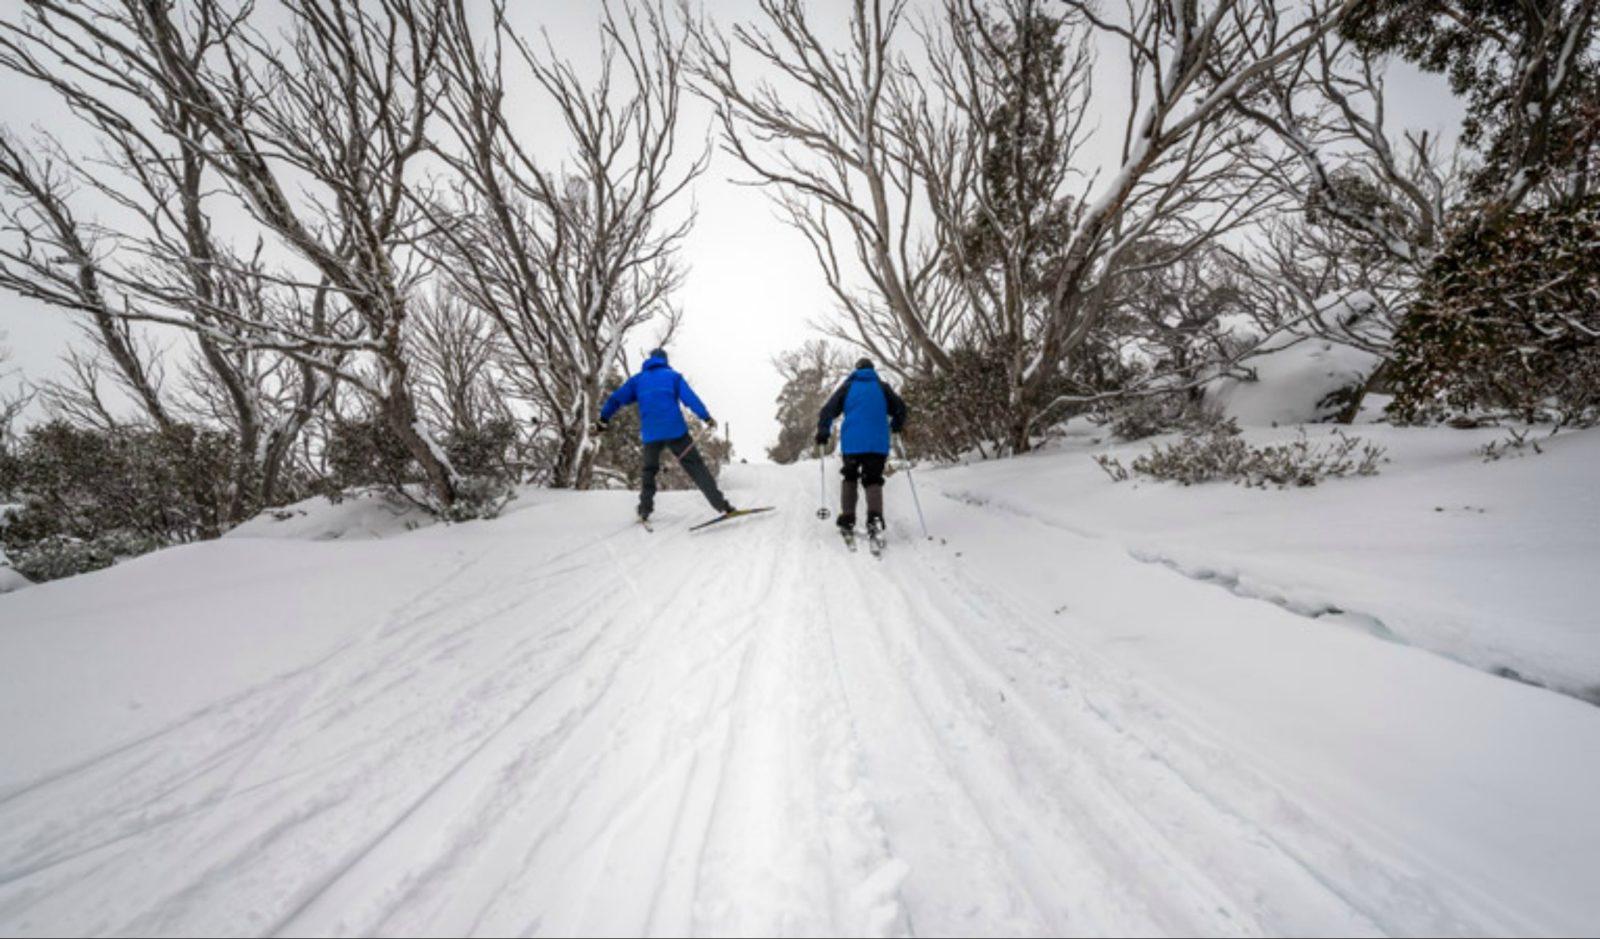 Perisher Range cross-country ski trails